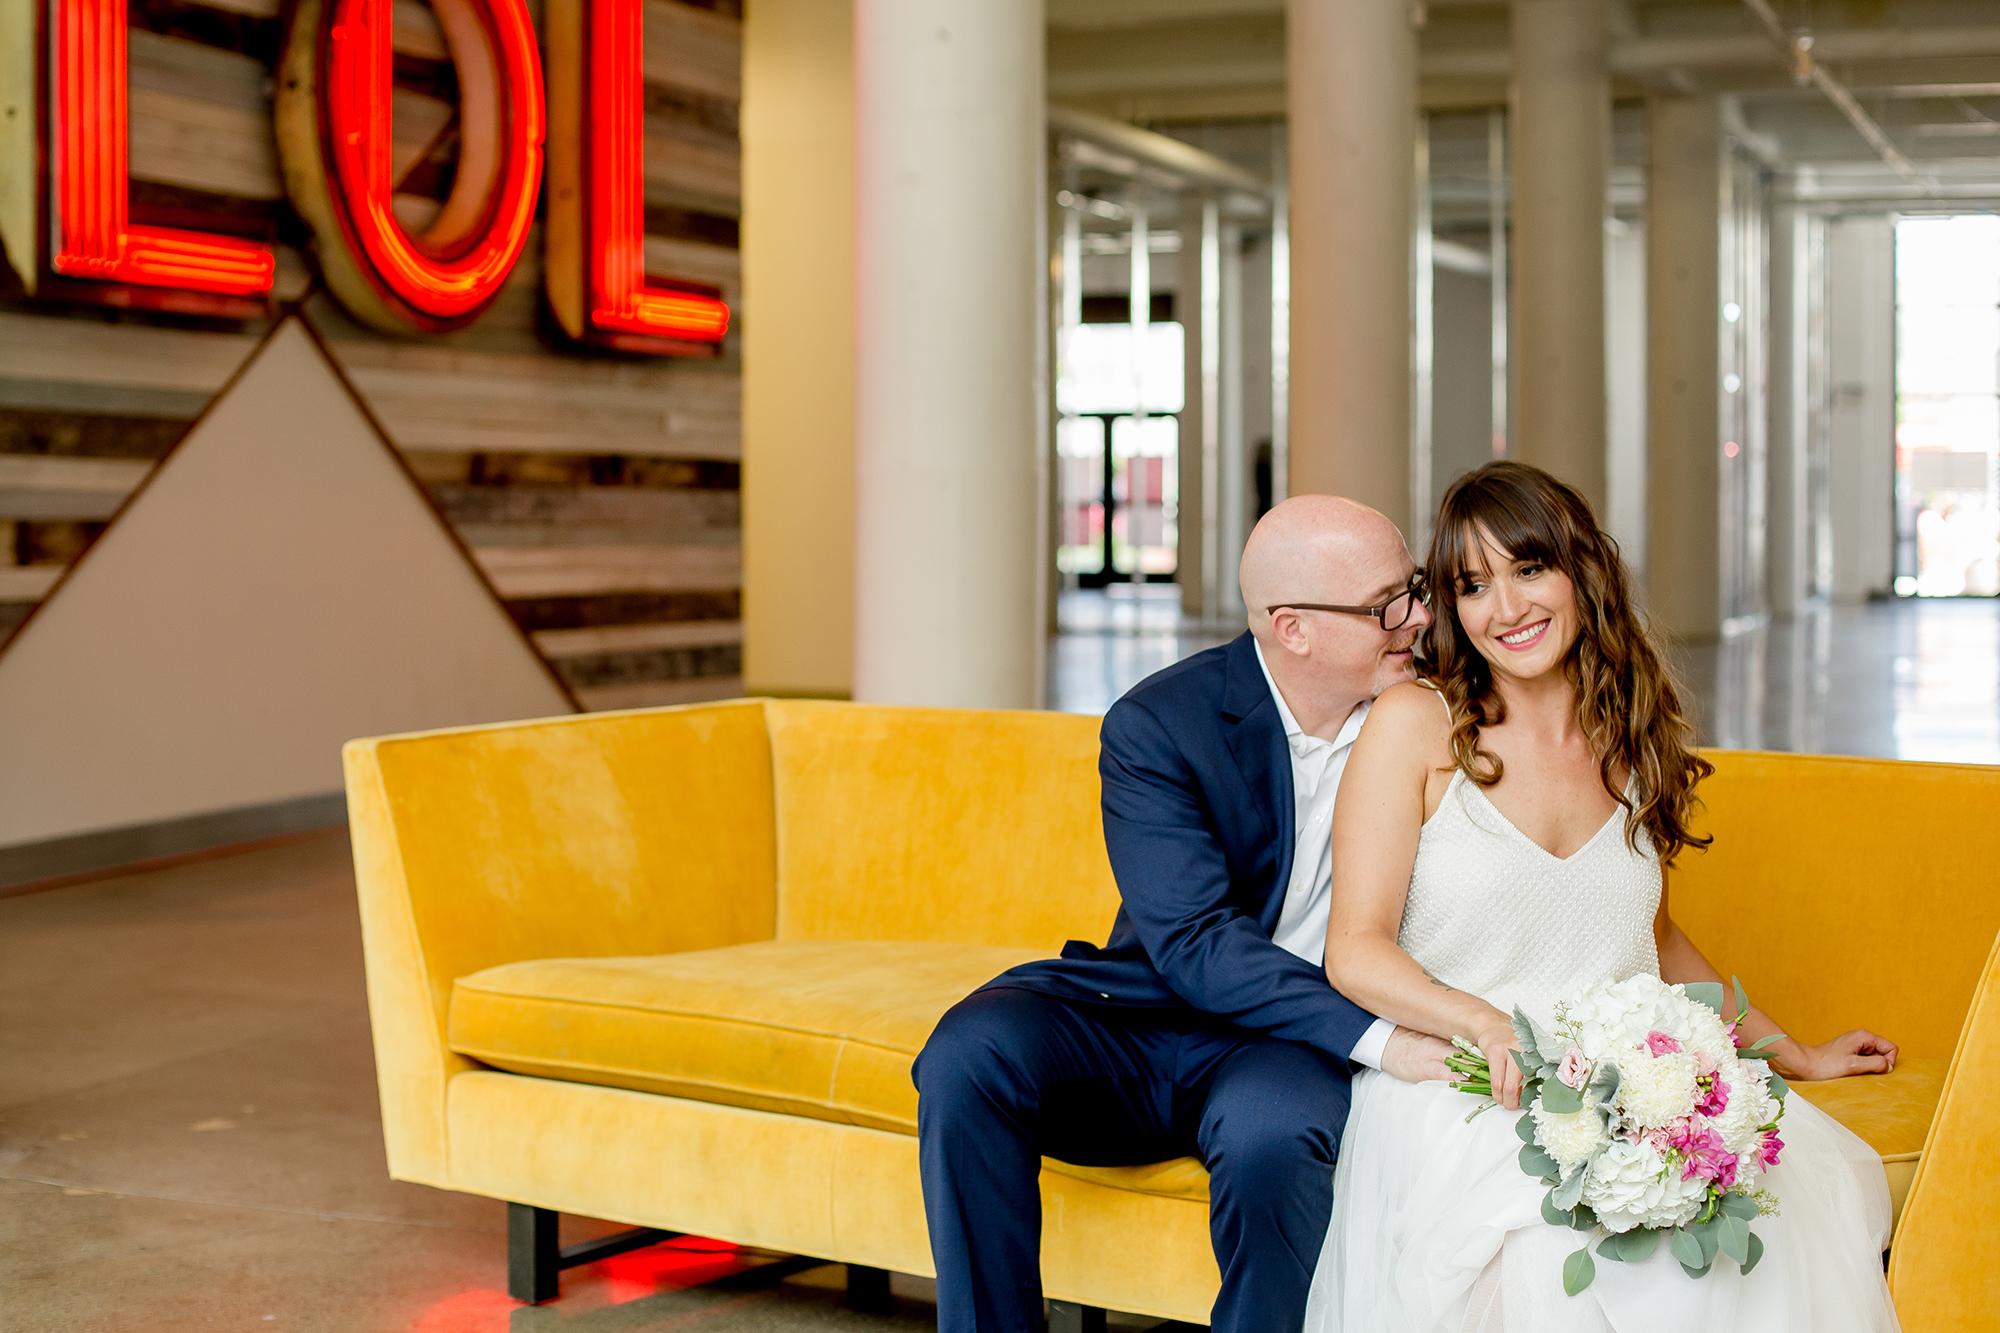 mpls wedding mn photography.jpg